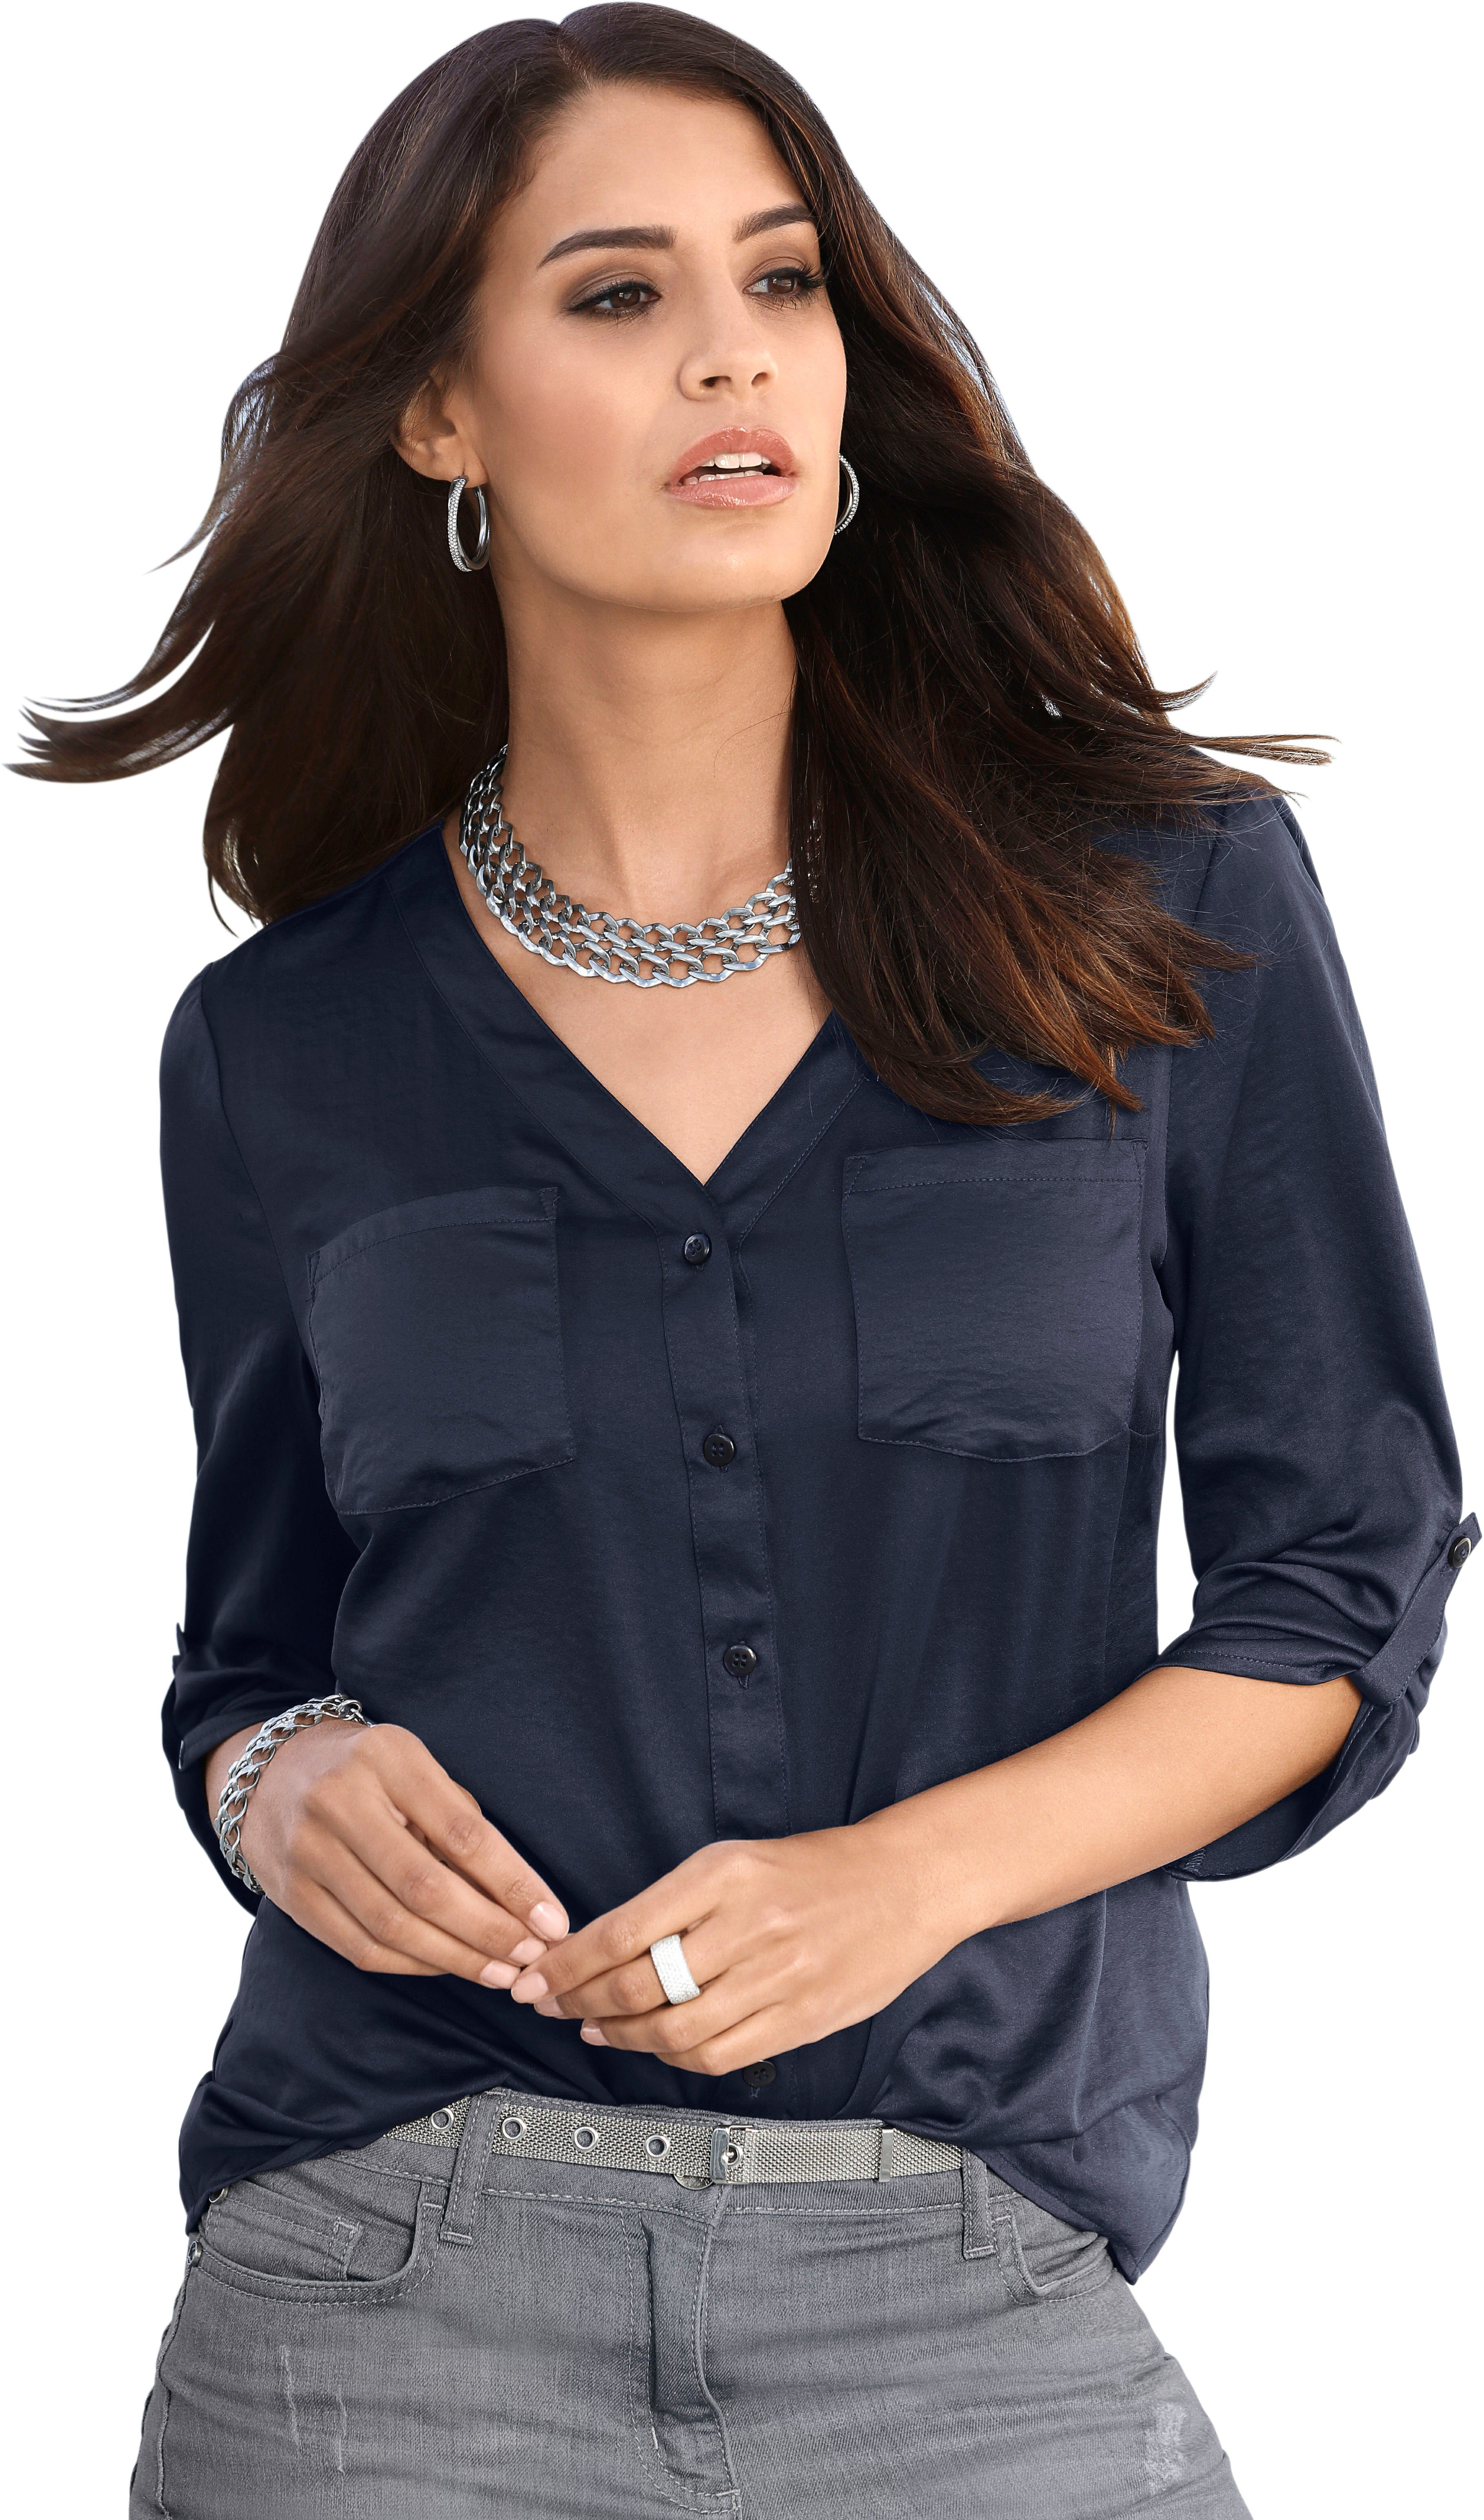 Afbeeldingsbron: CRÉATION L blouse van gewassen satijn